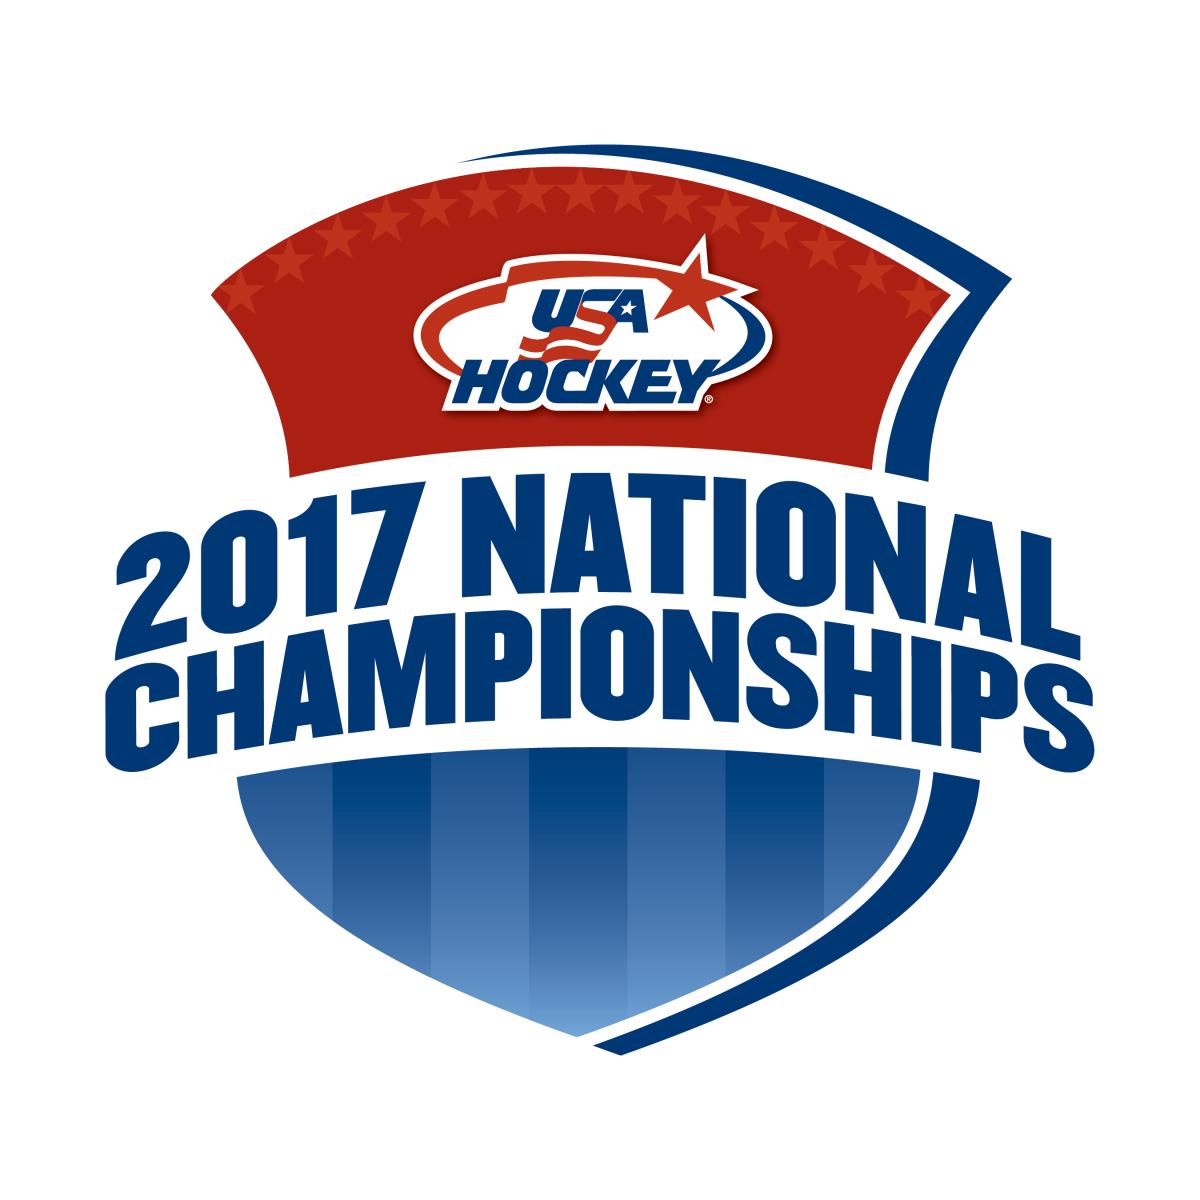 2017 National Championship